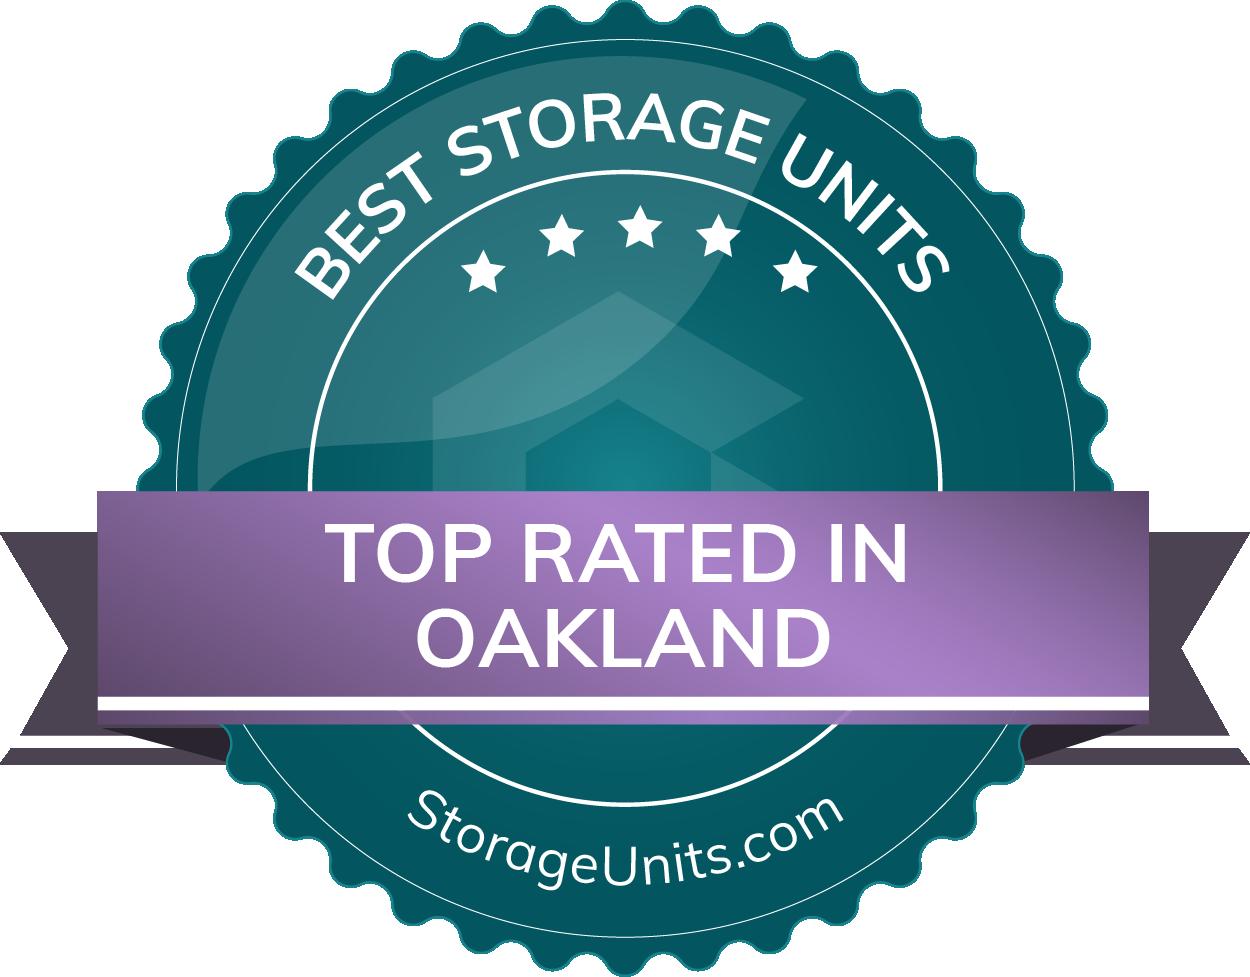 Best Self Storage Units in Oakland, CA